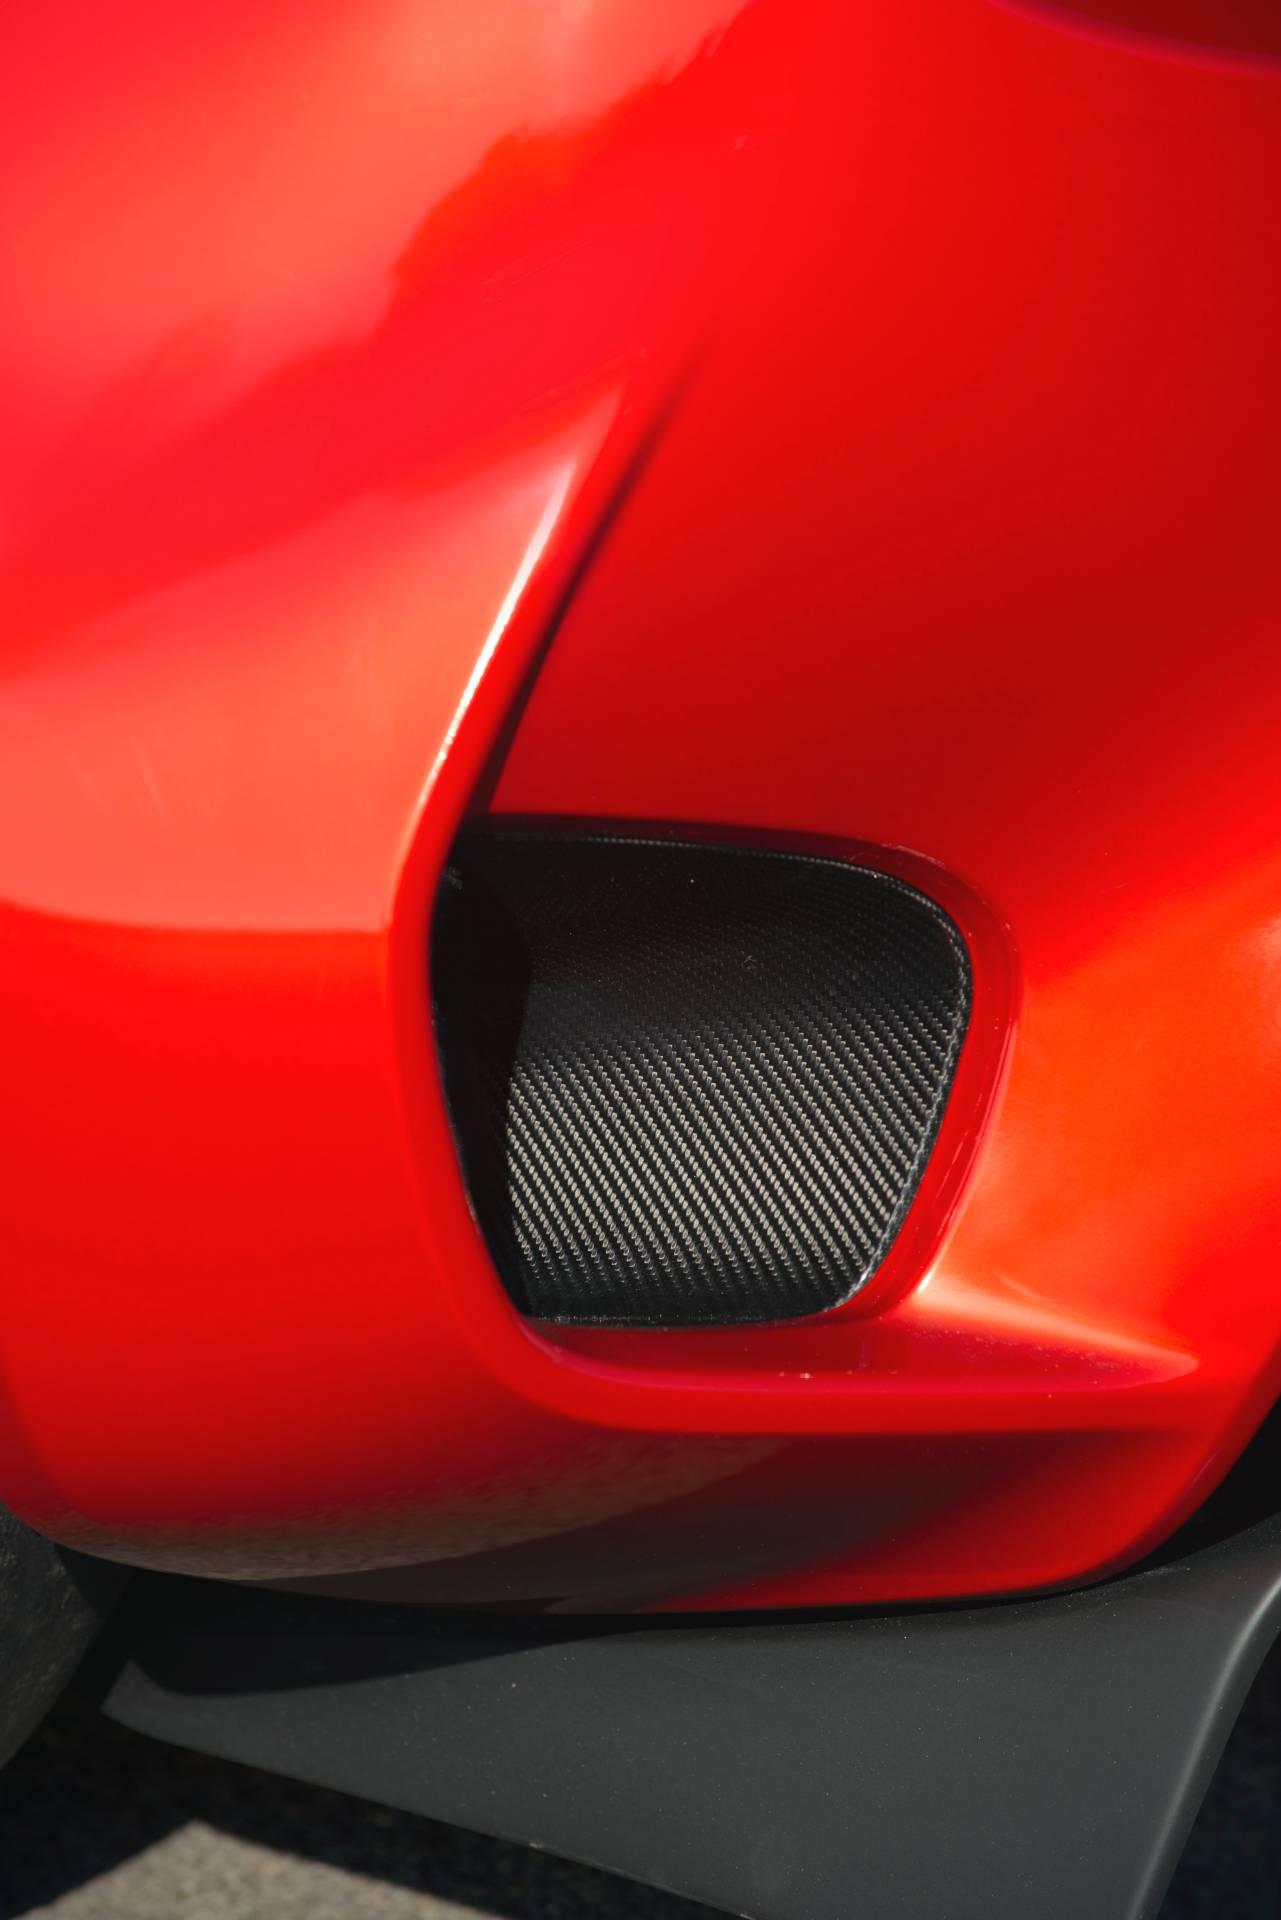 Lotus-Evora-GT4-Concept-22